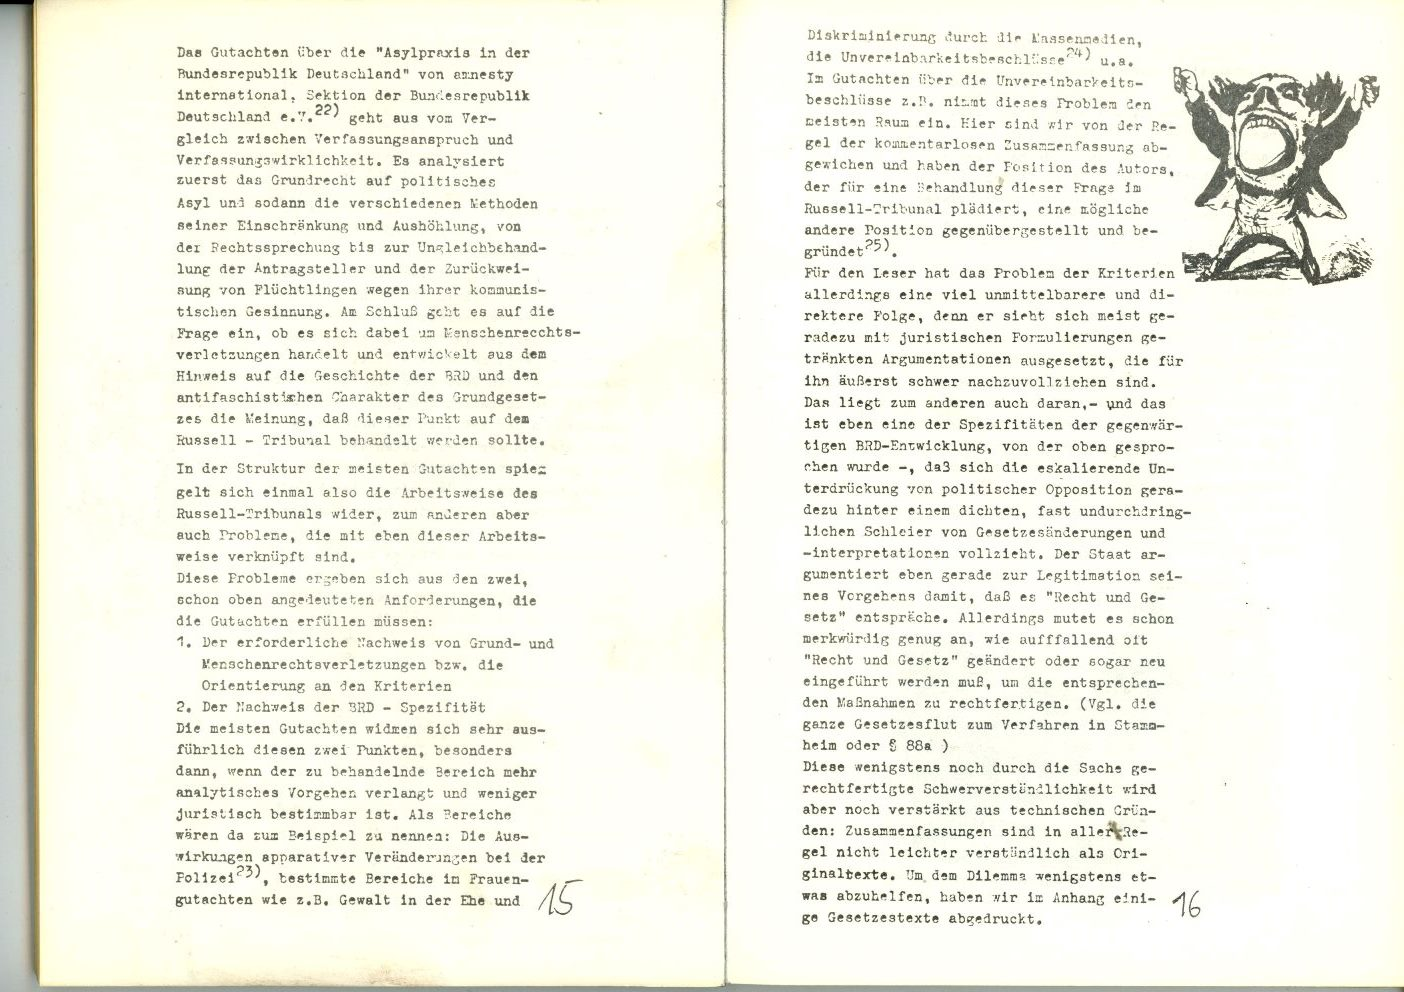 Marburg_Russell_Initiative_1978_09